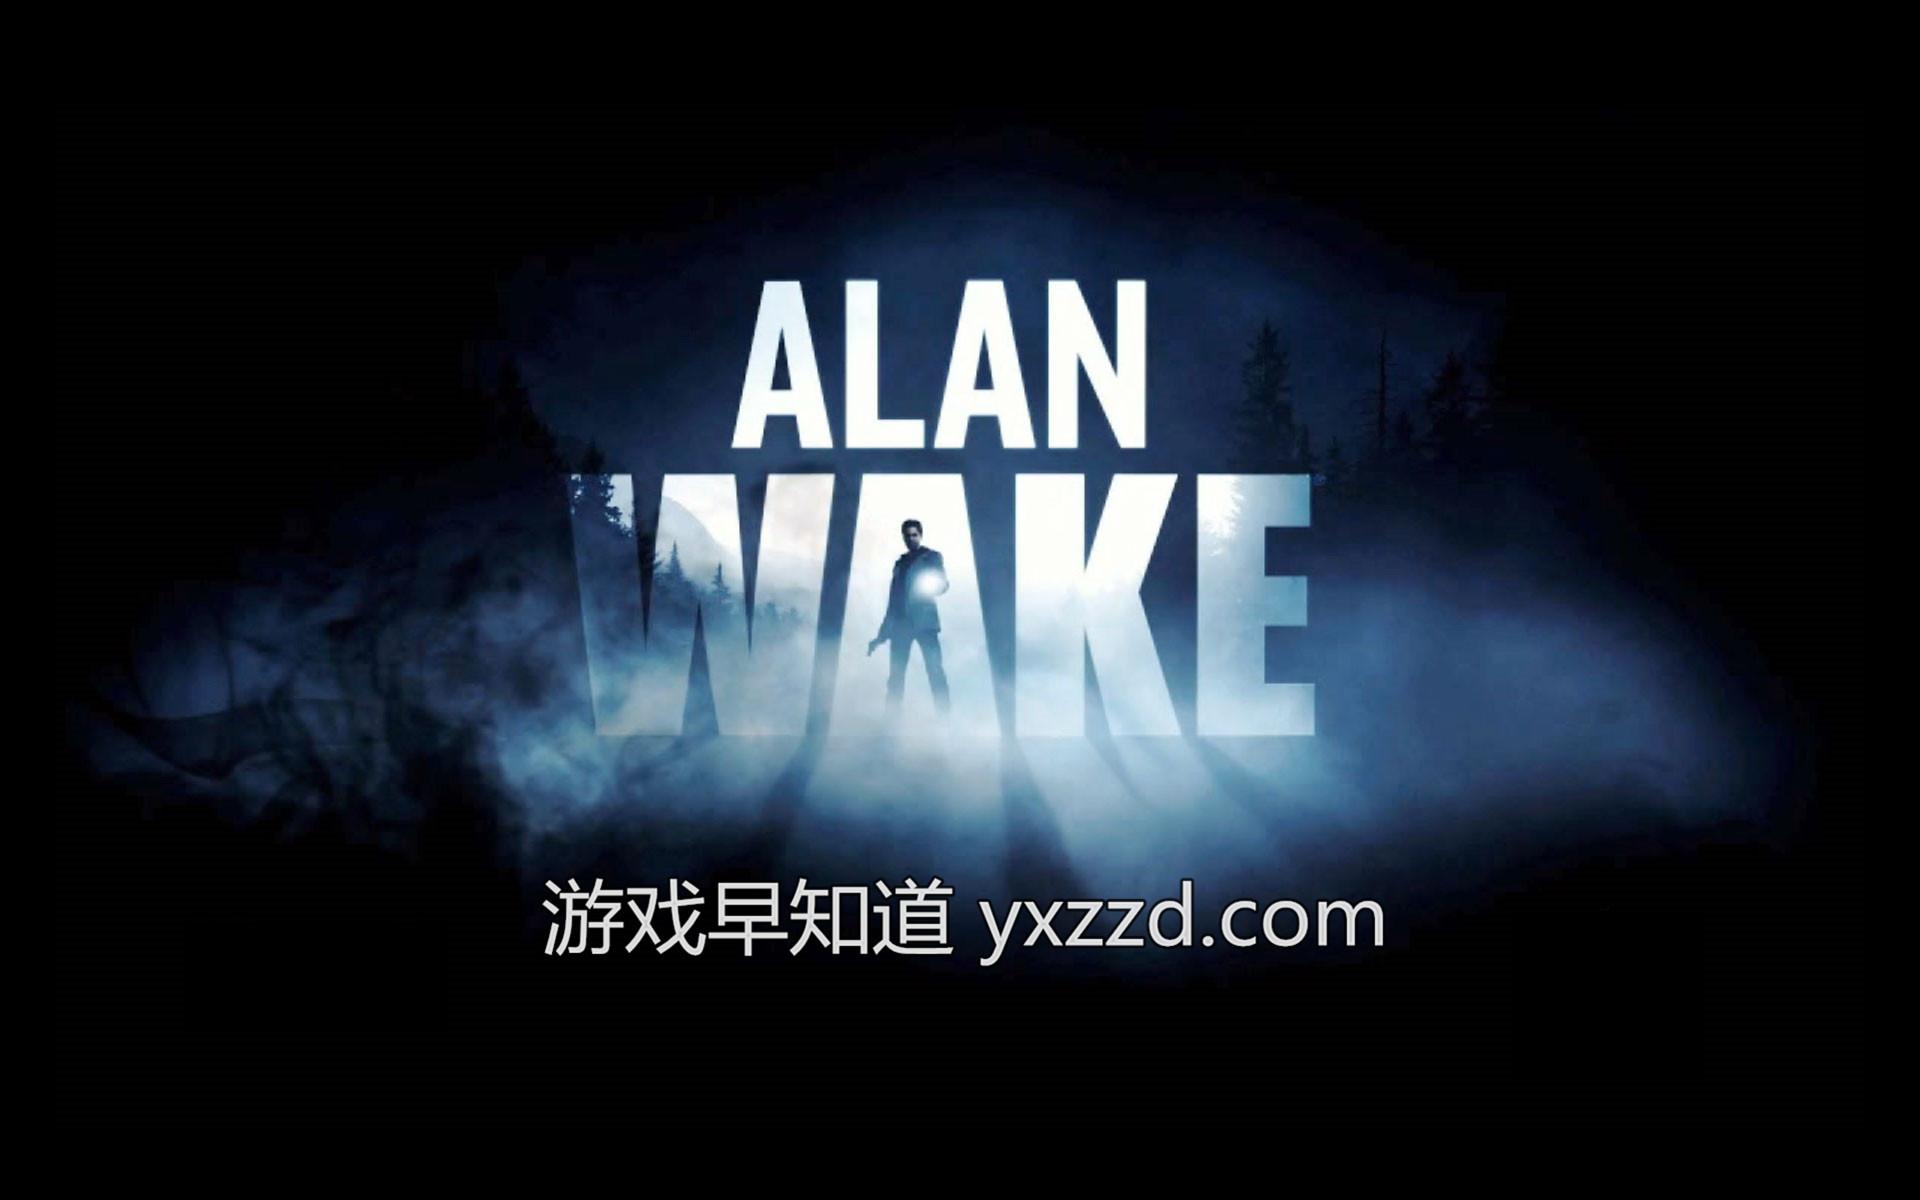 心灵杀手回归Alan-Wake return